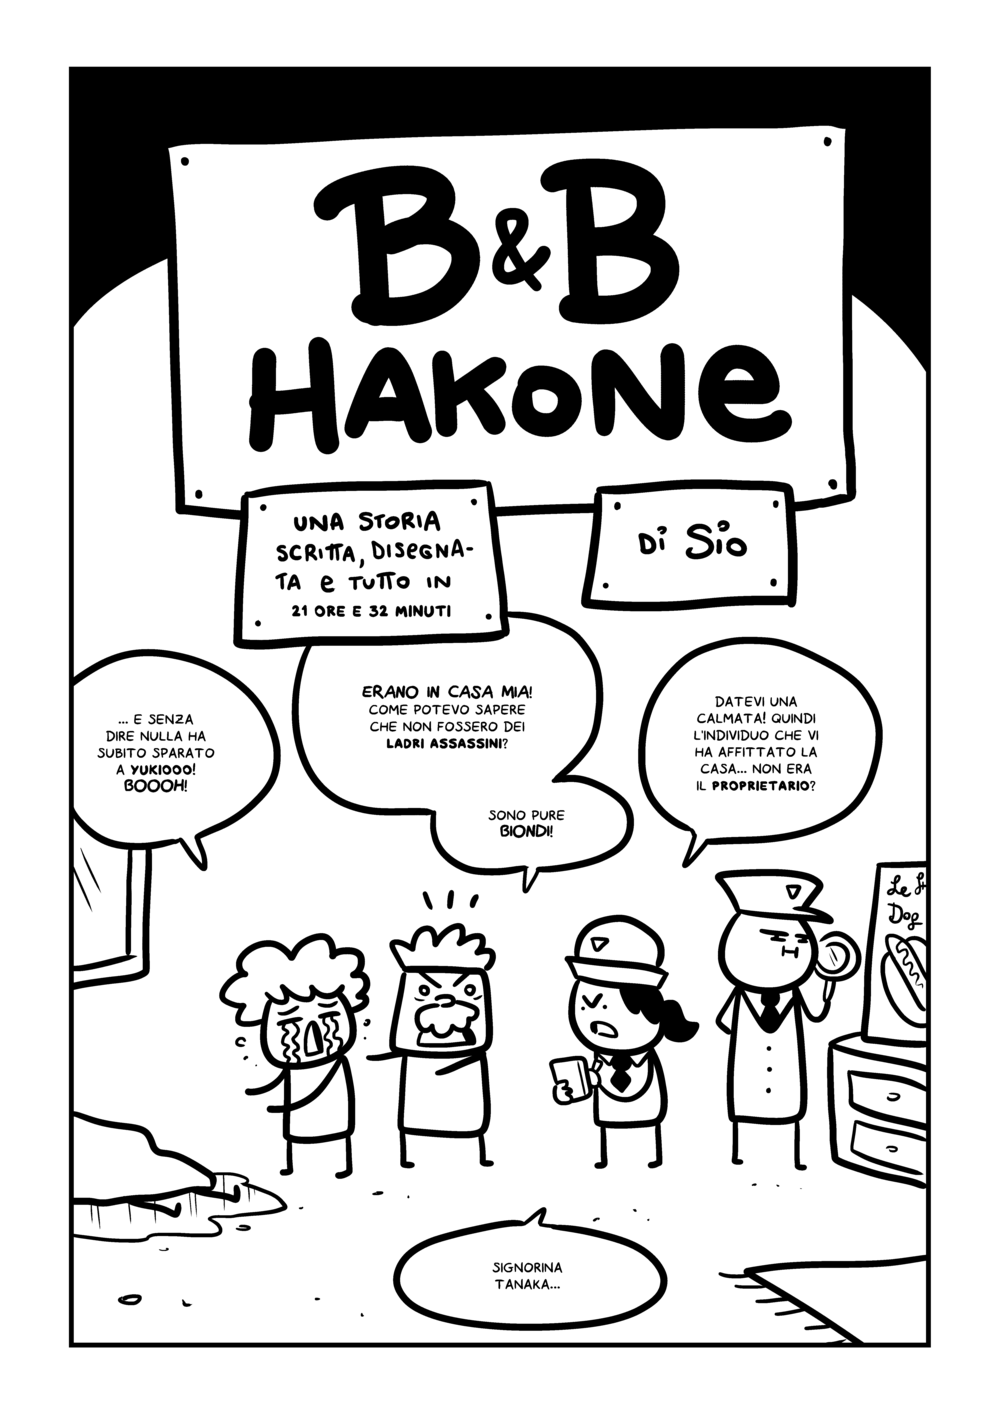 BnB Hakone_003.png